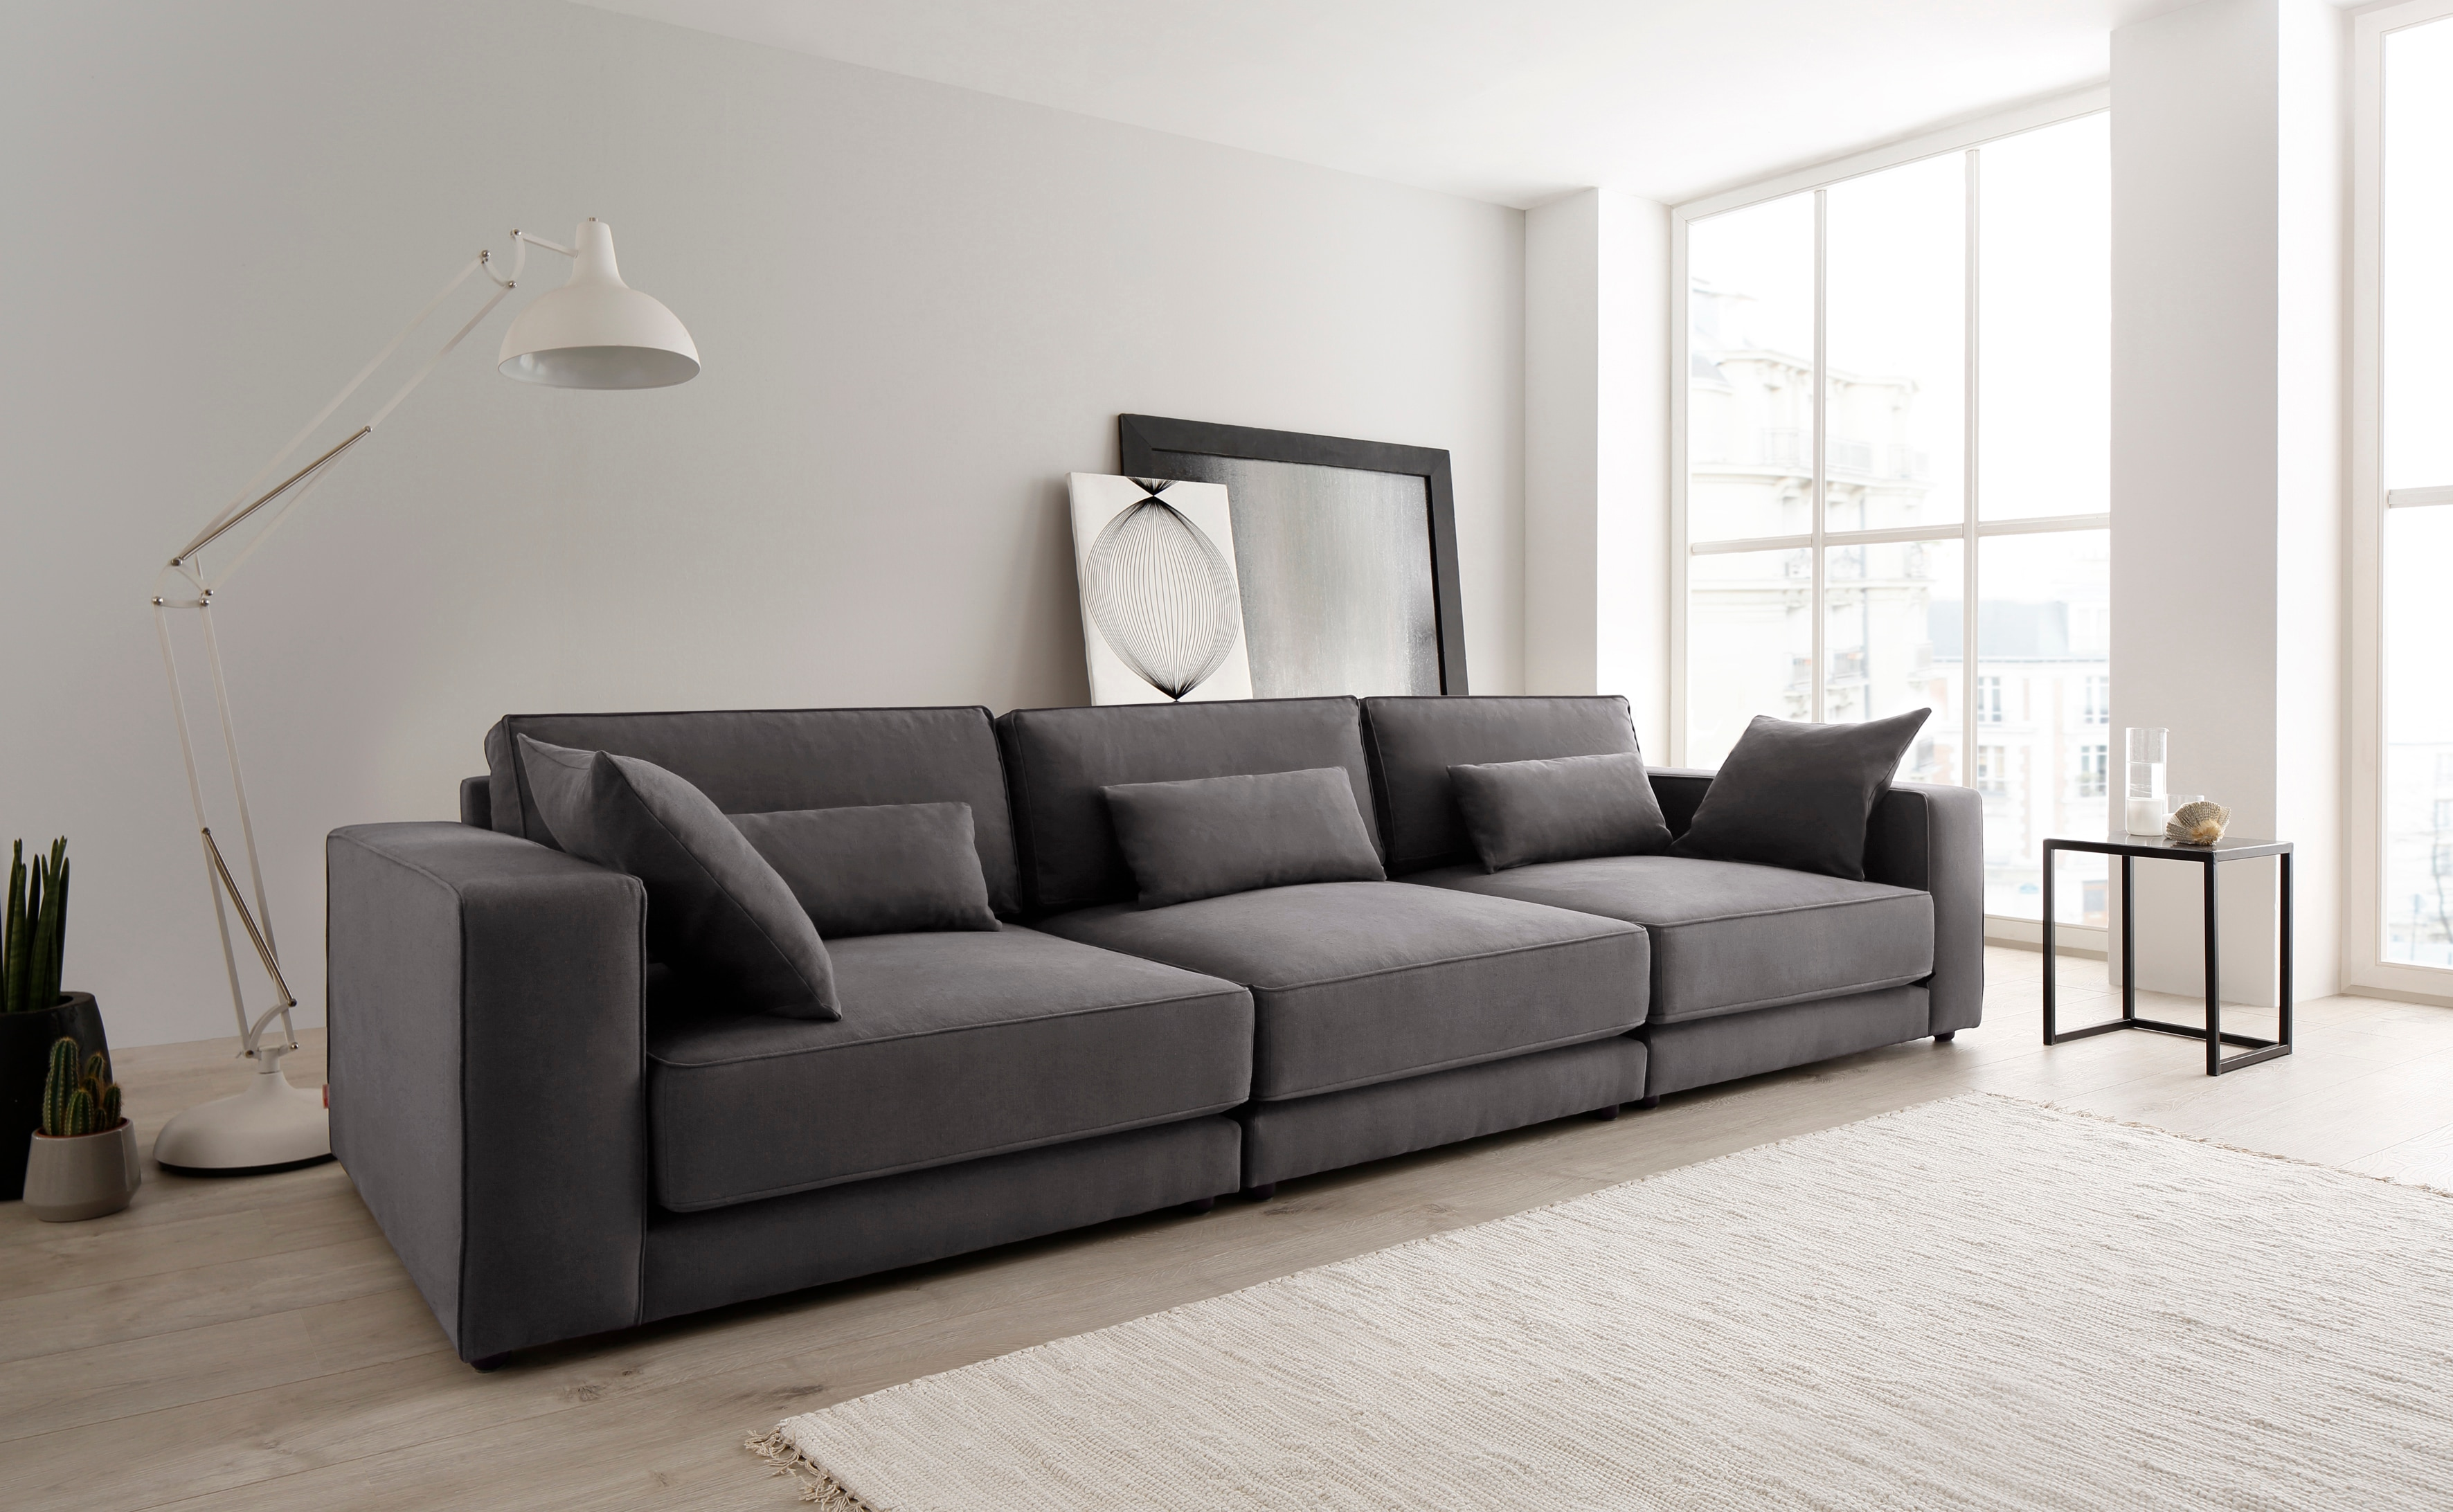 OTTO products Big-Sofa Grenette